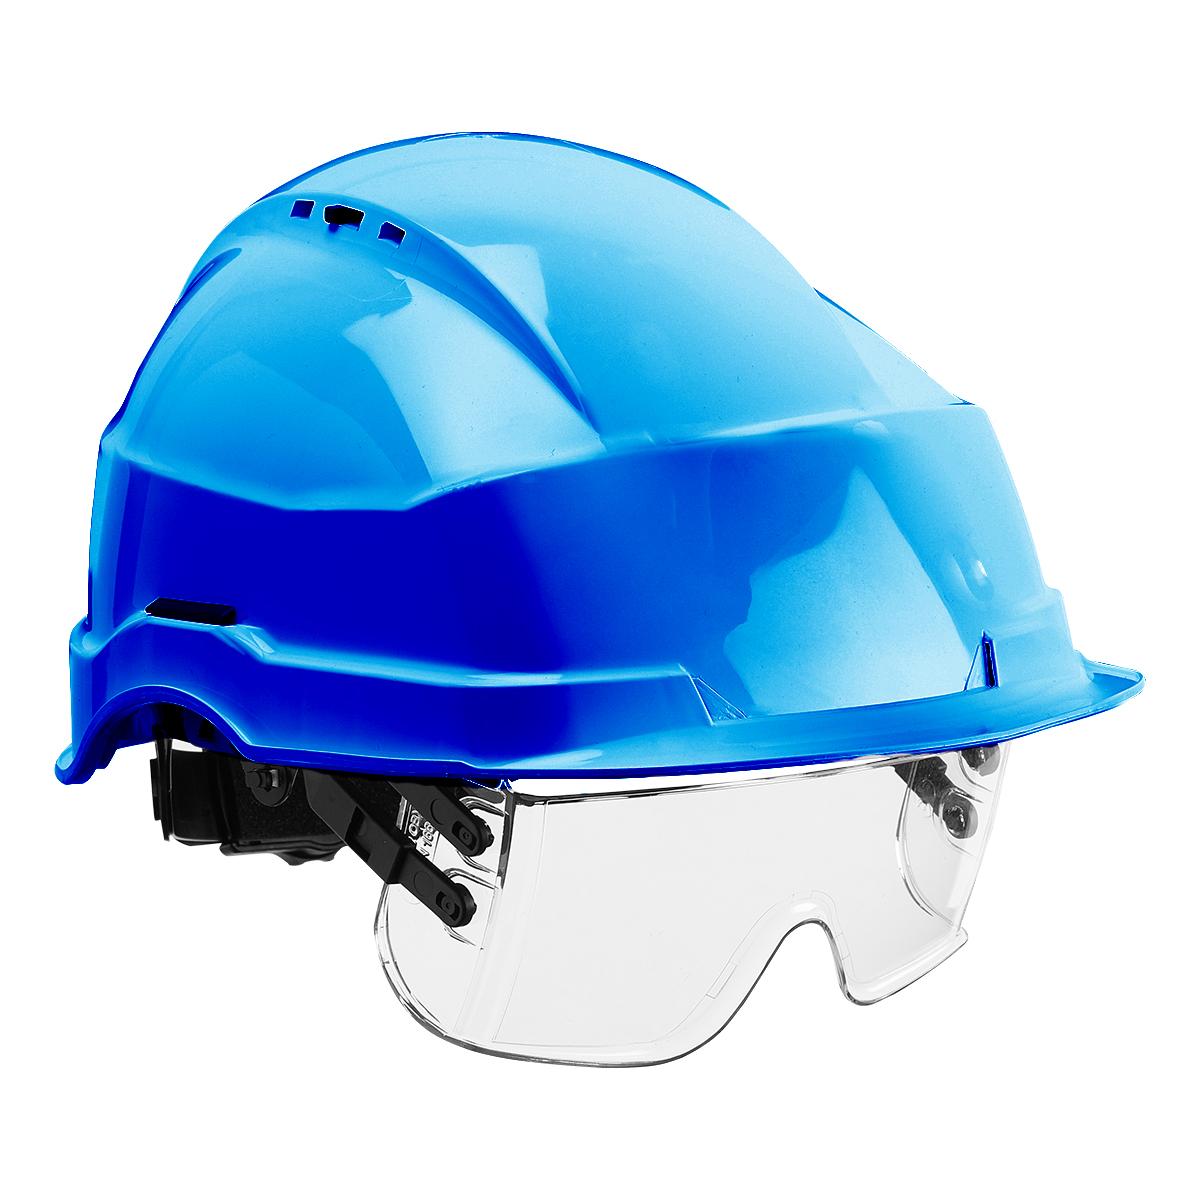 HF0510_Iris II Safety Helmet and Visor_Blue